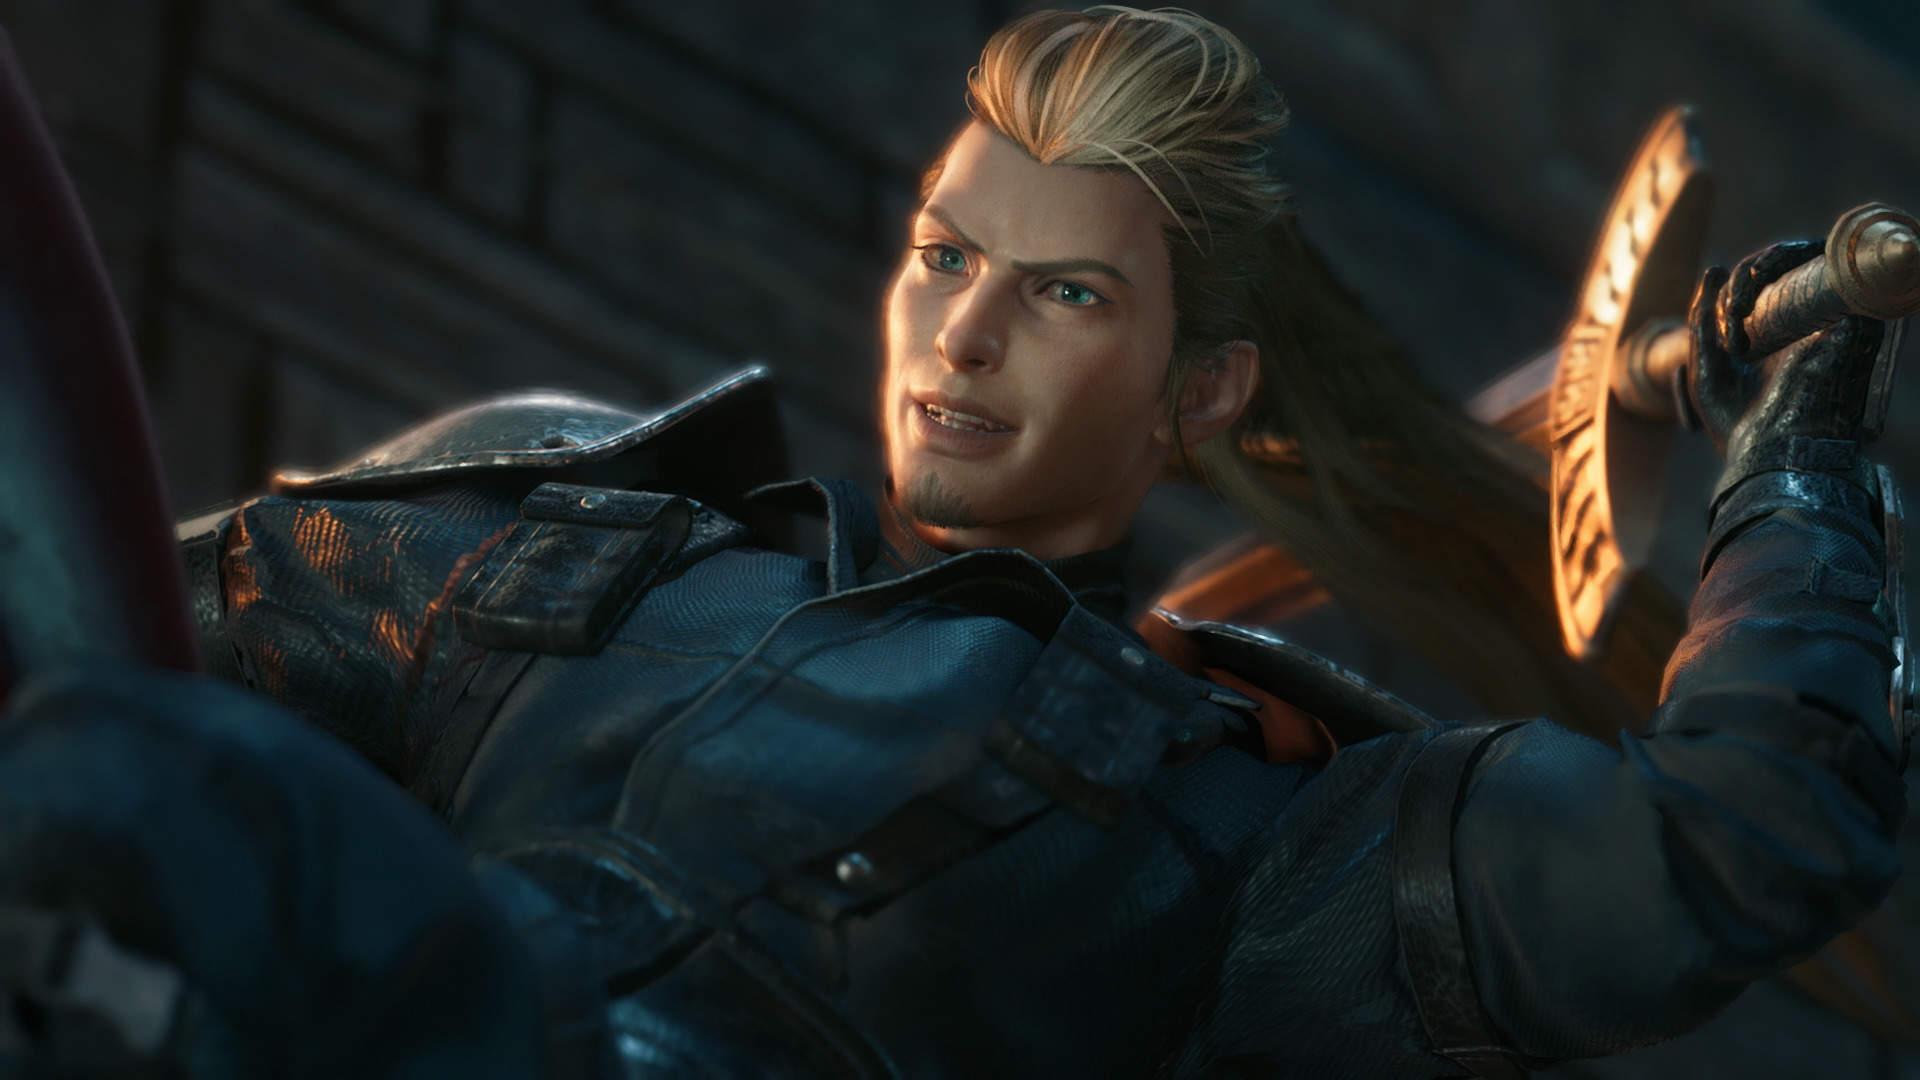 Final Fantasy Vii Remake Screenshots Highlight Shinra